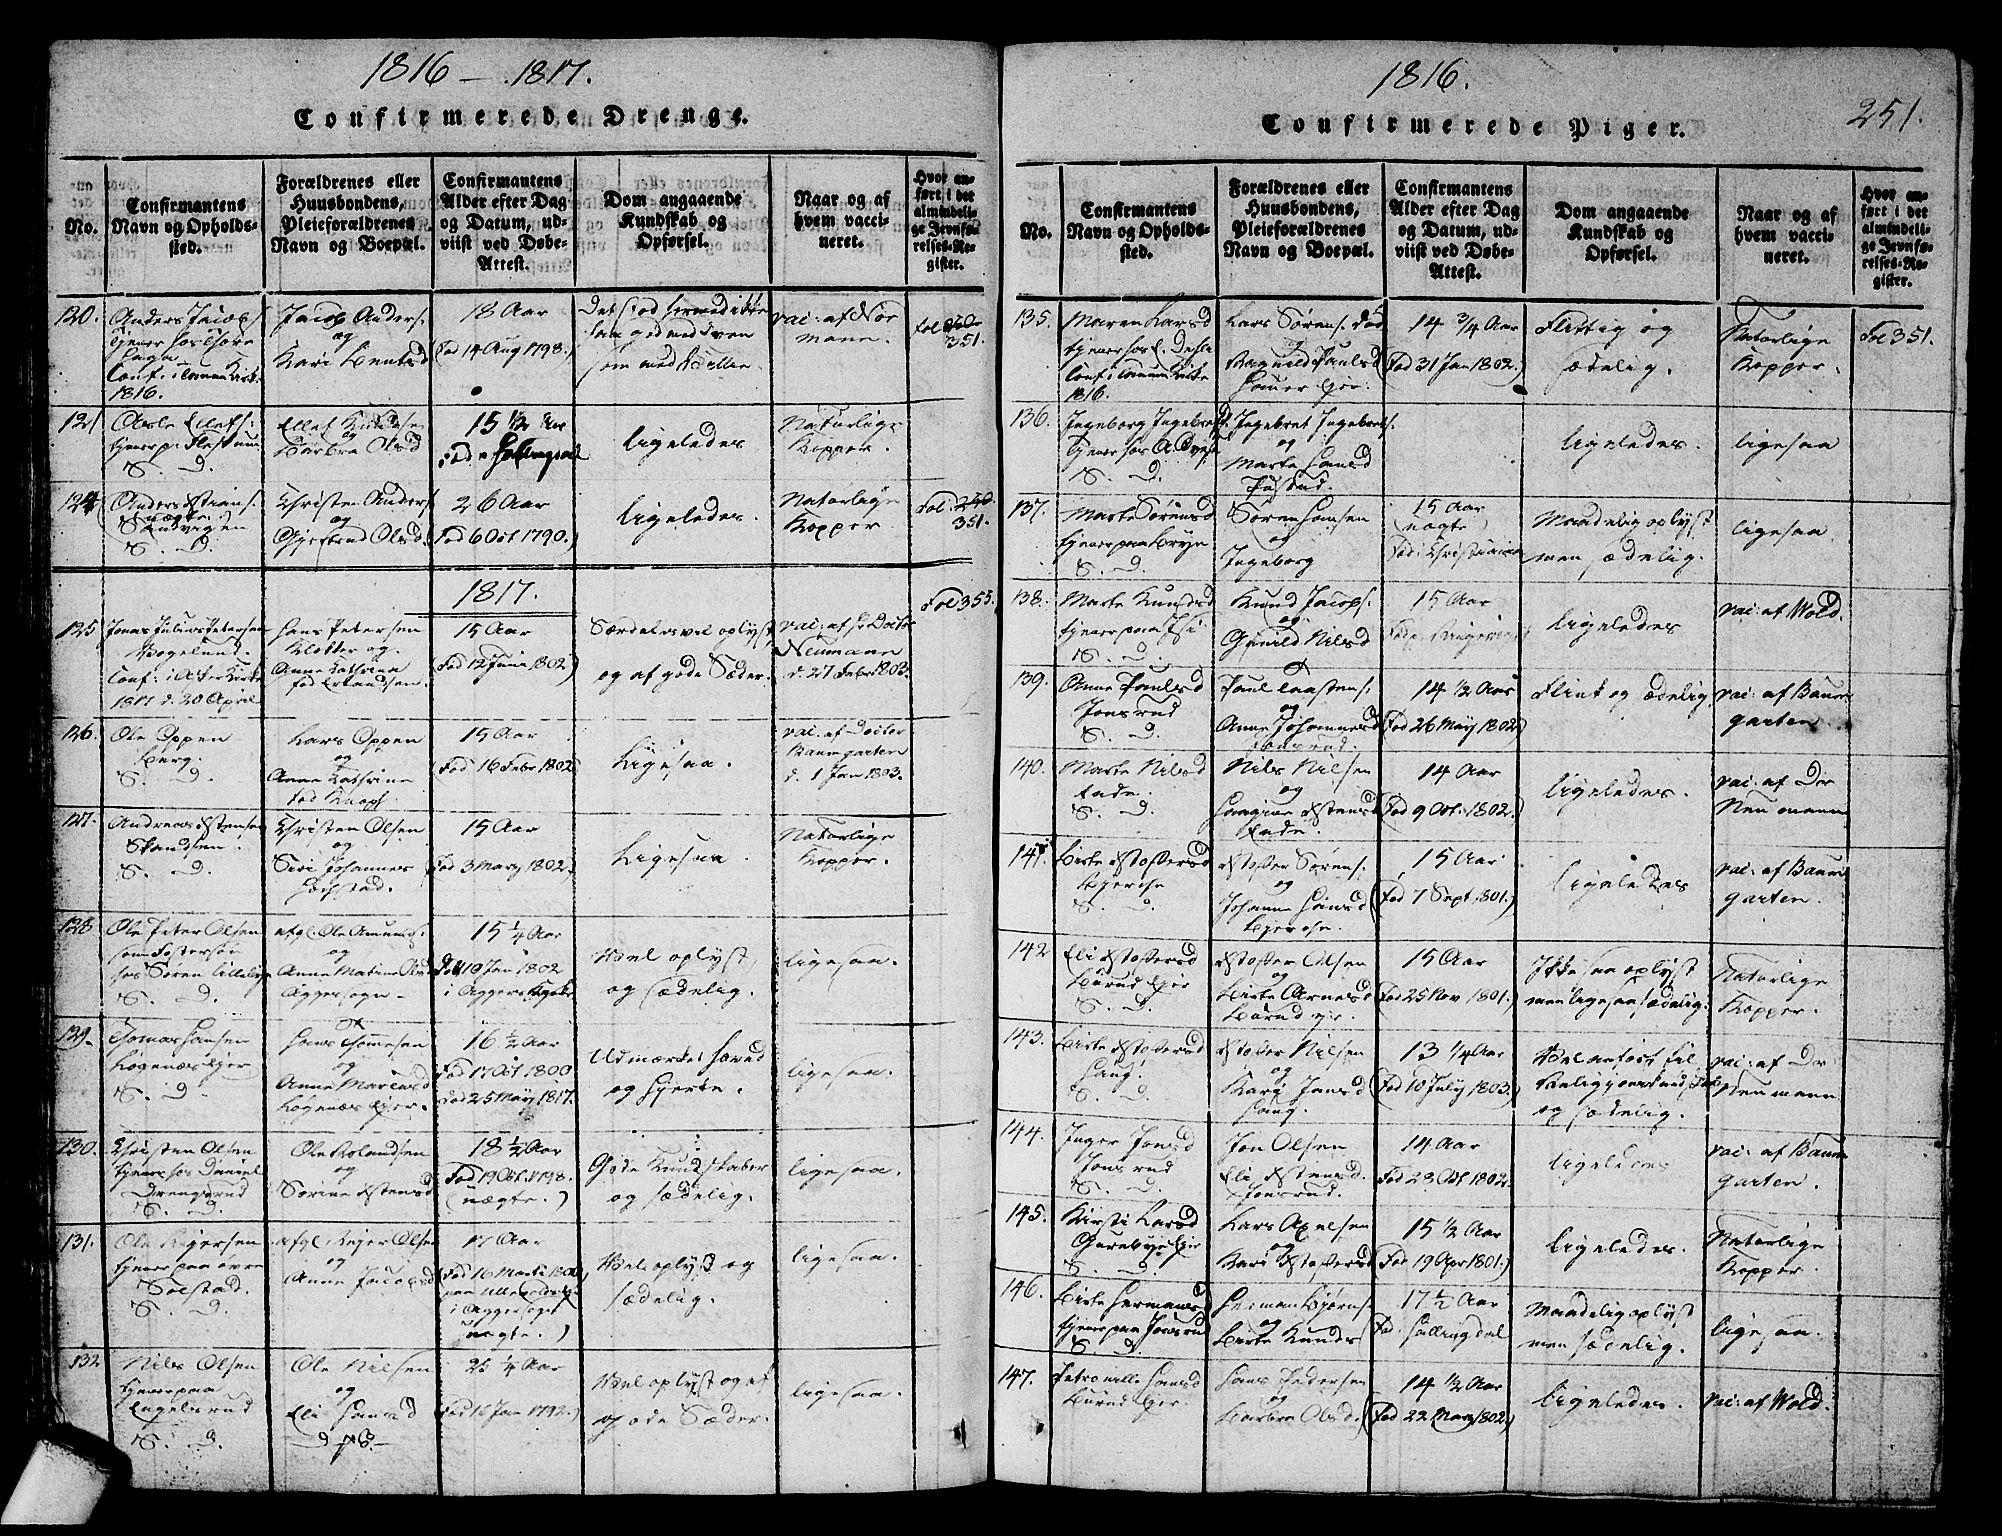 SAO, Asker prestekontor Kirkebøker, G/Ga/L0001: Klokkerbok nr. I 1, 1814-1830, s. 251